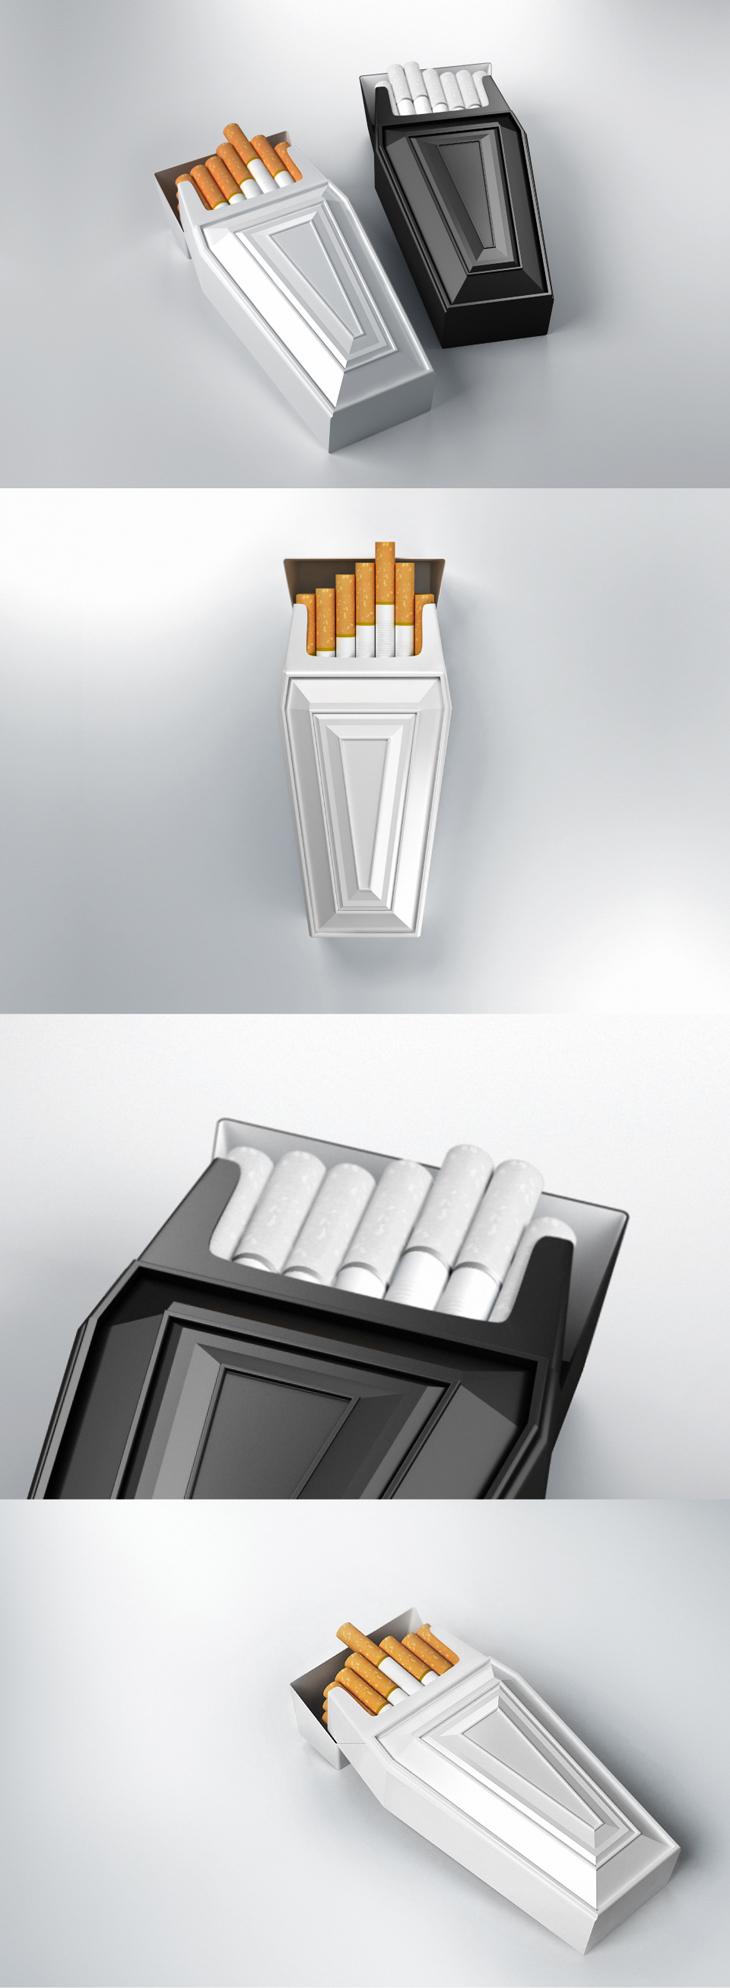 antismokepack-ain